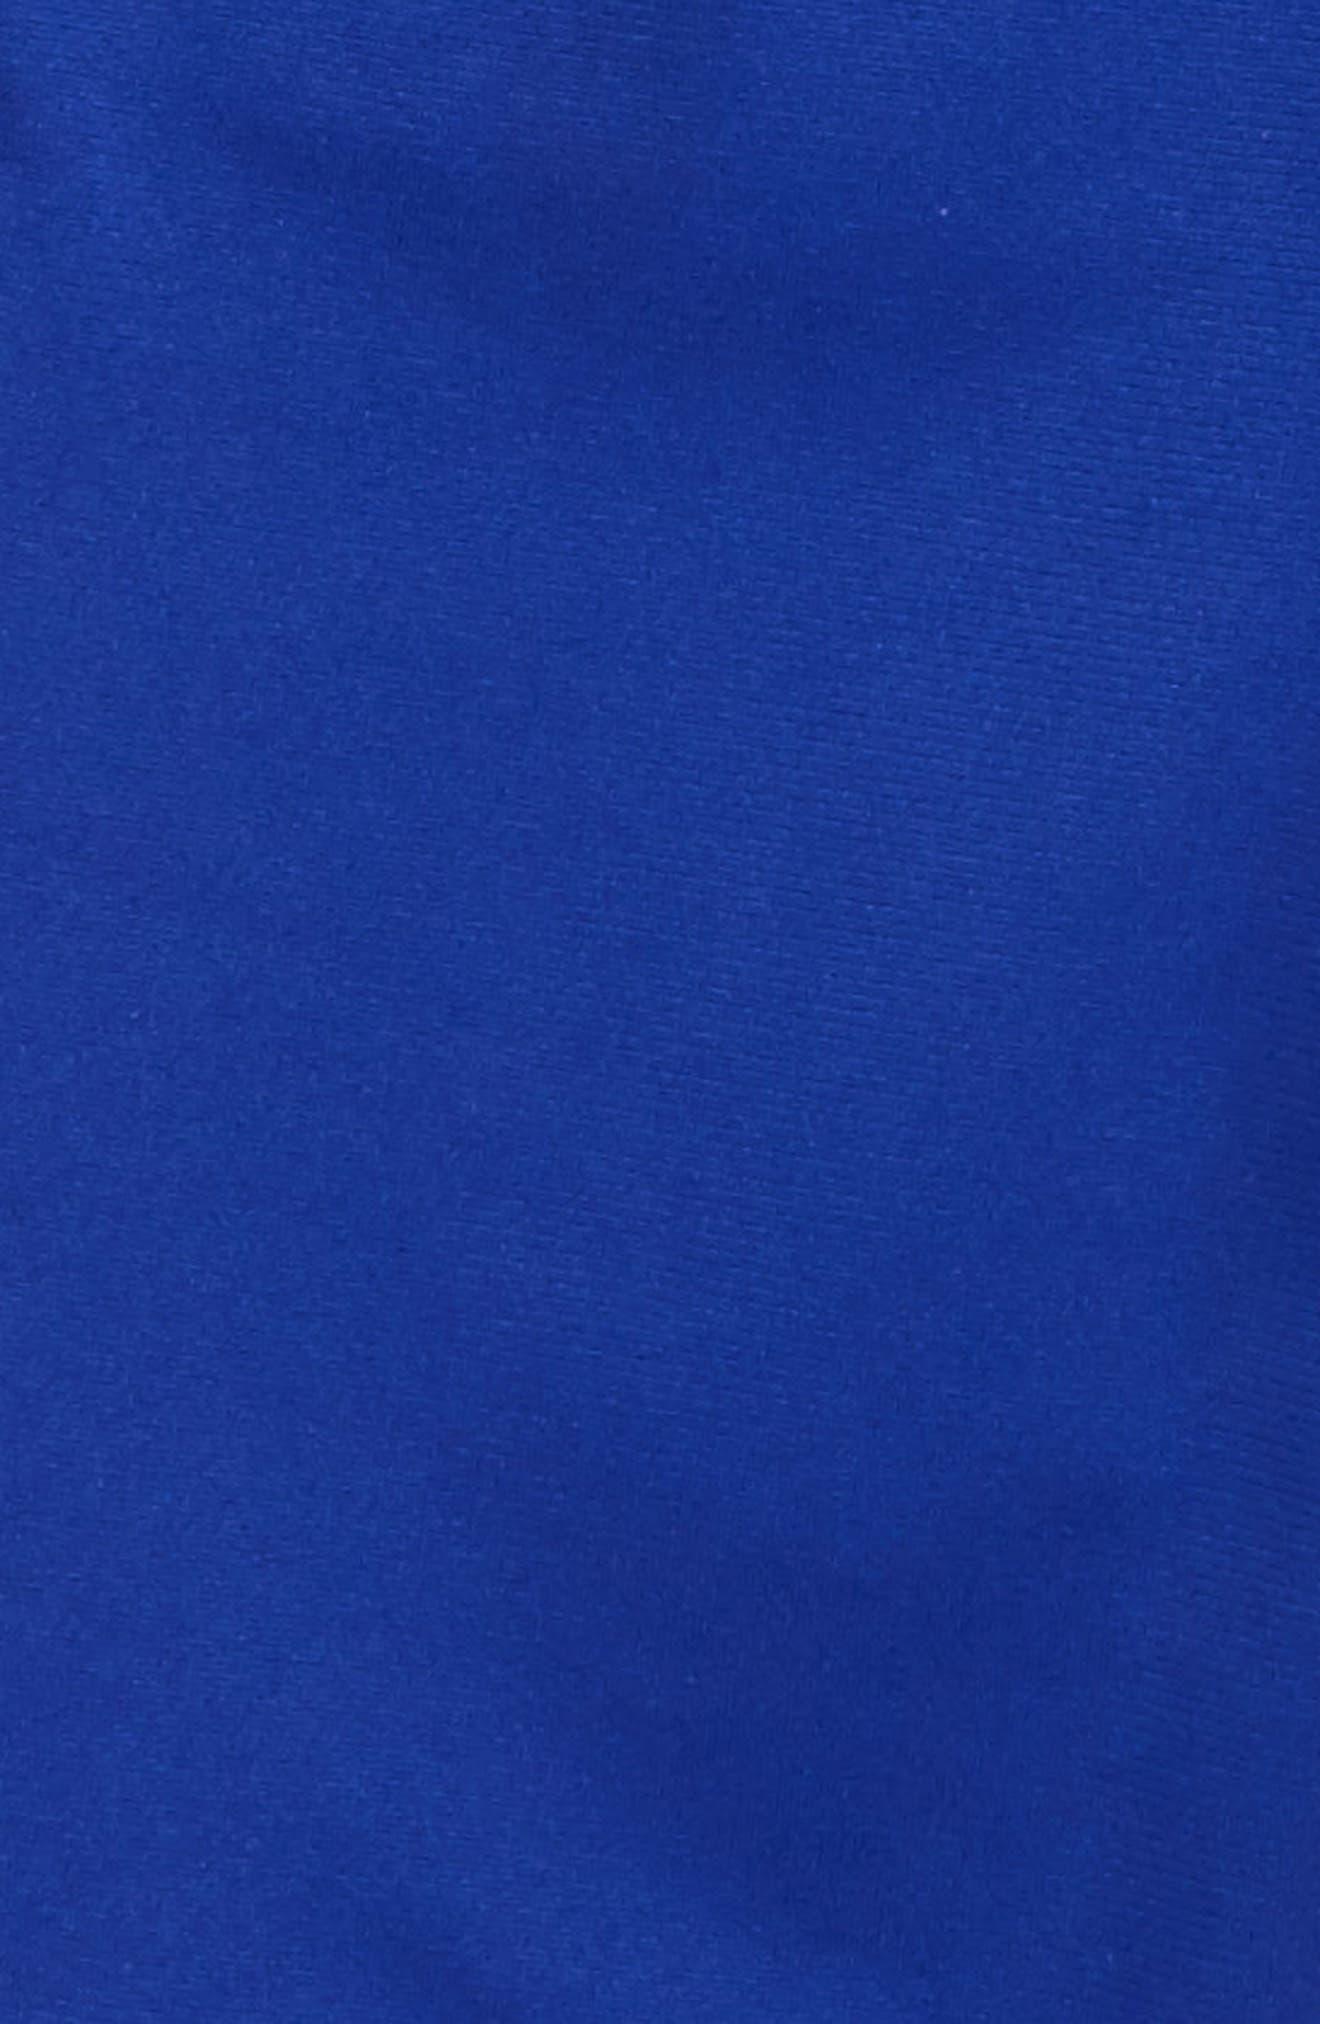 EQT Superstar Jacket & Pants Set,                             Alternate thumbnail 3, color,                             Mystery Ink/ White